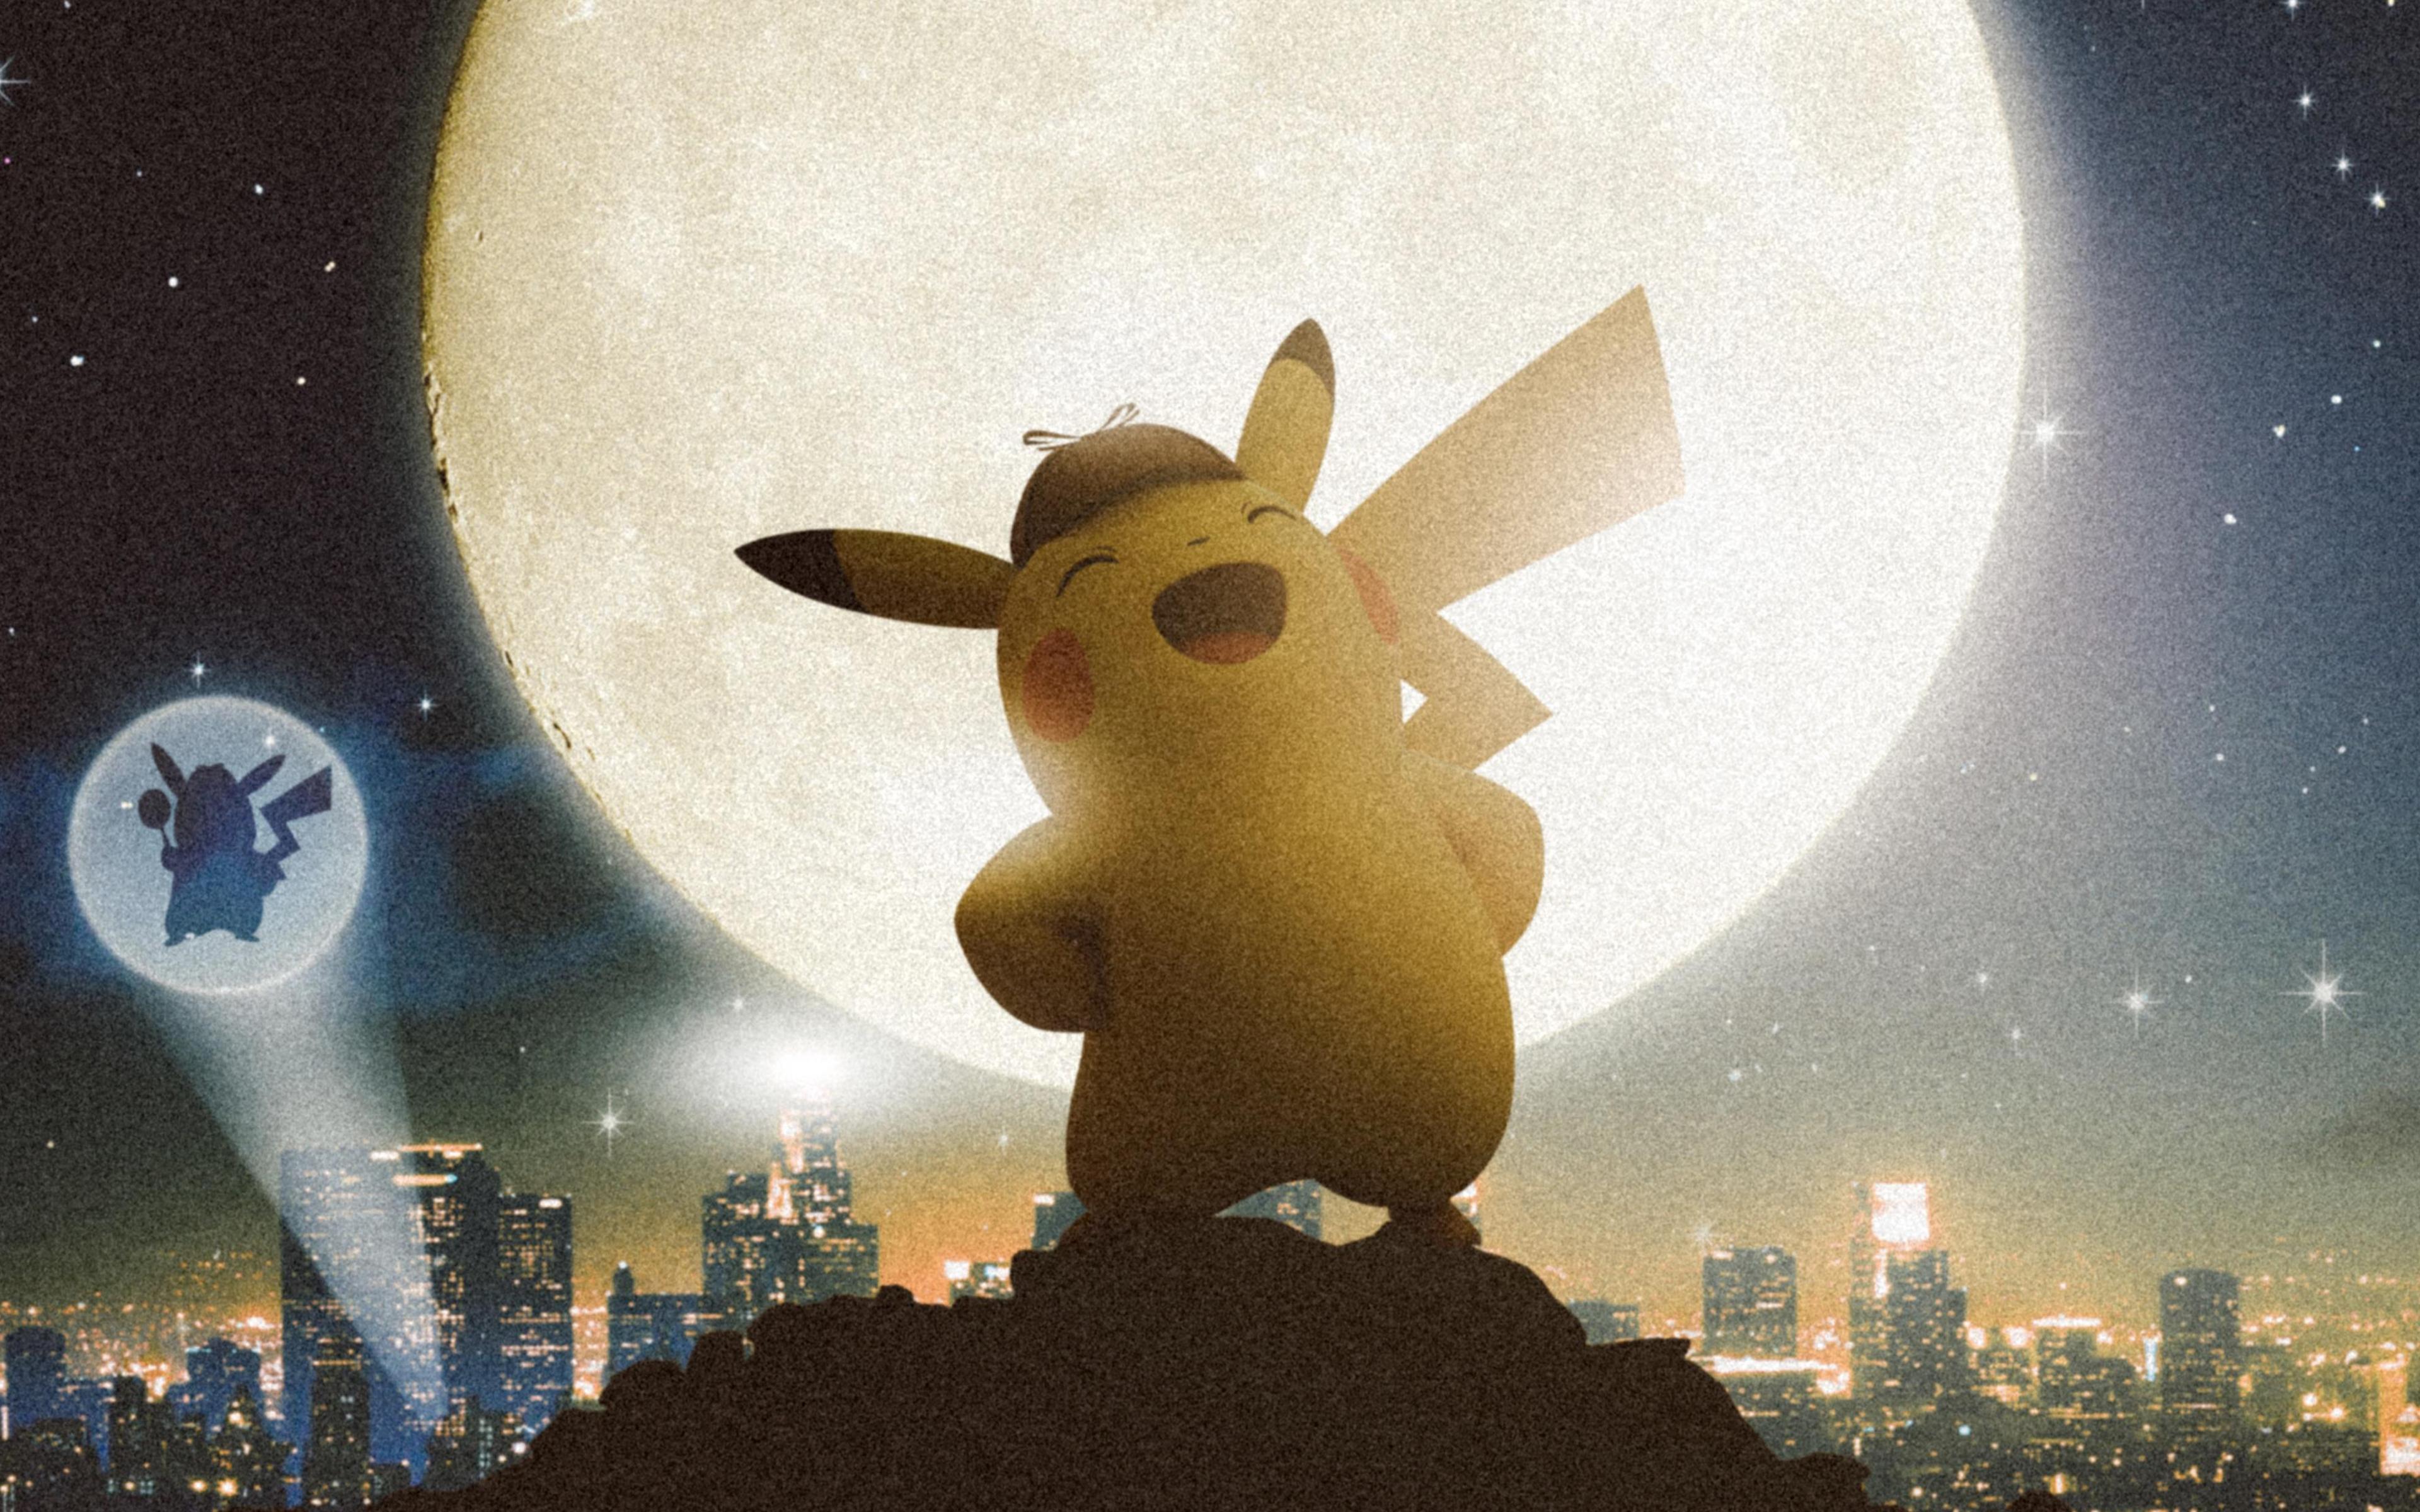 3840x2400 Detective Pikachu 4k HD 4k Wallpapers, Images ...